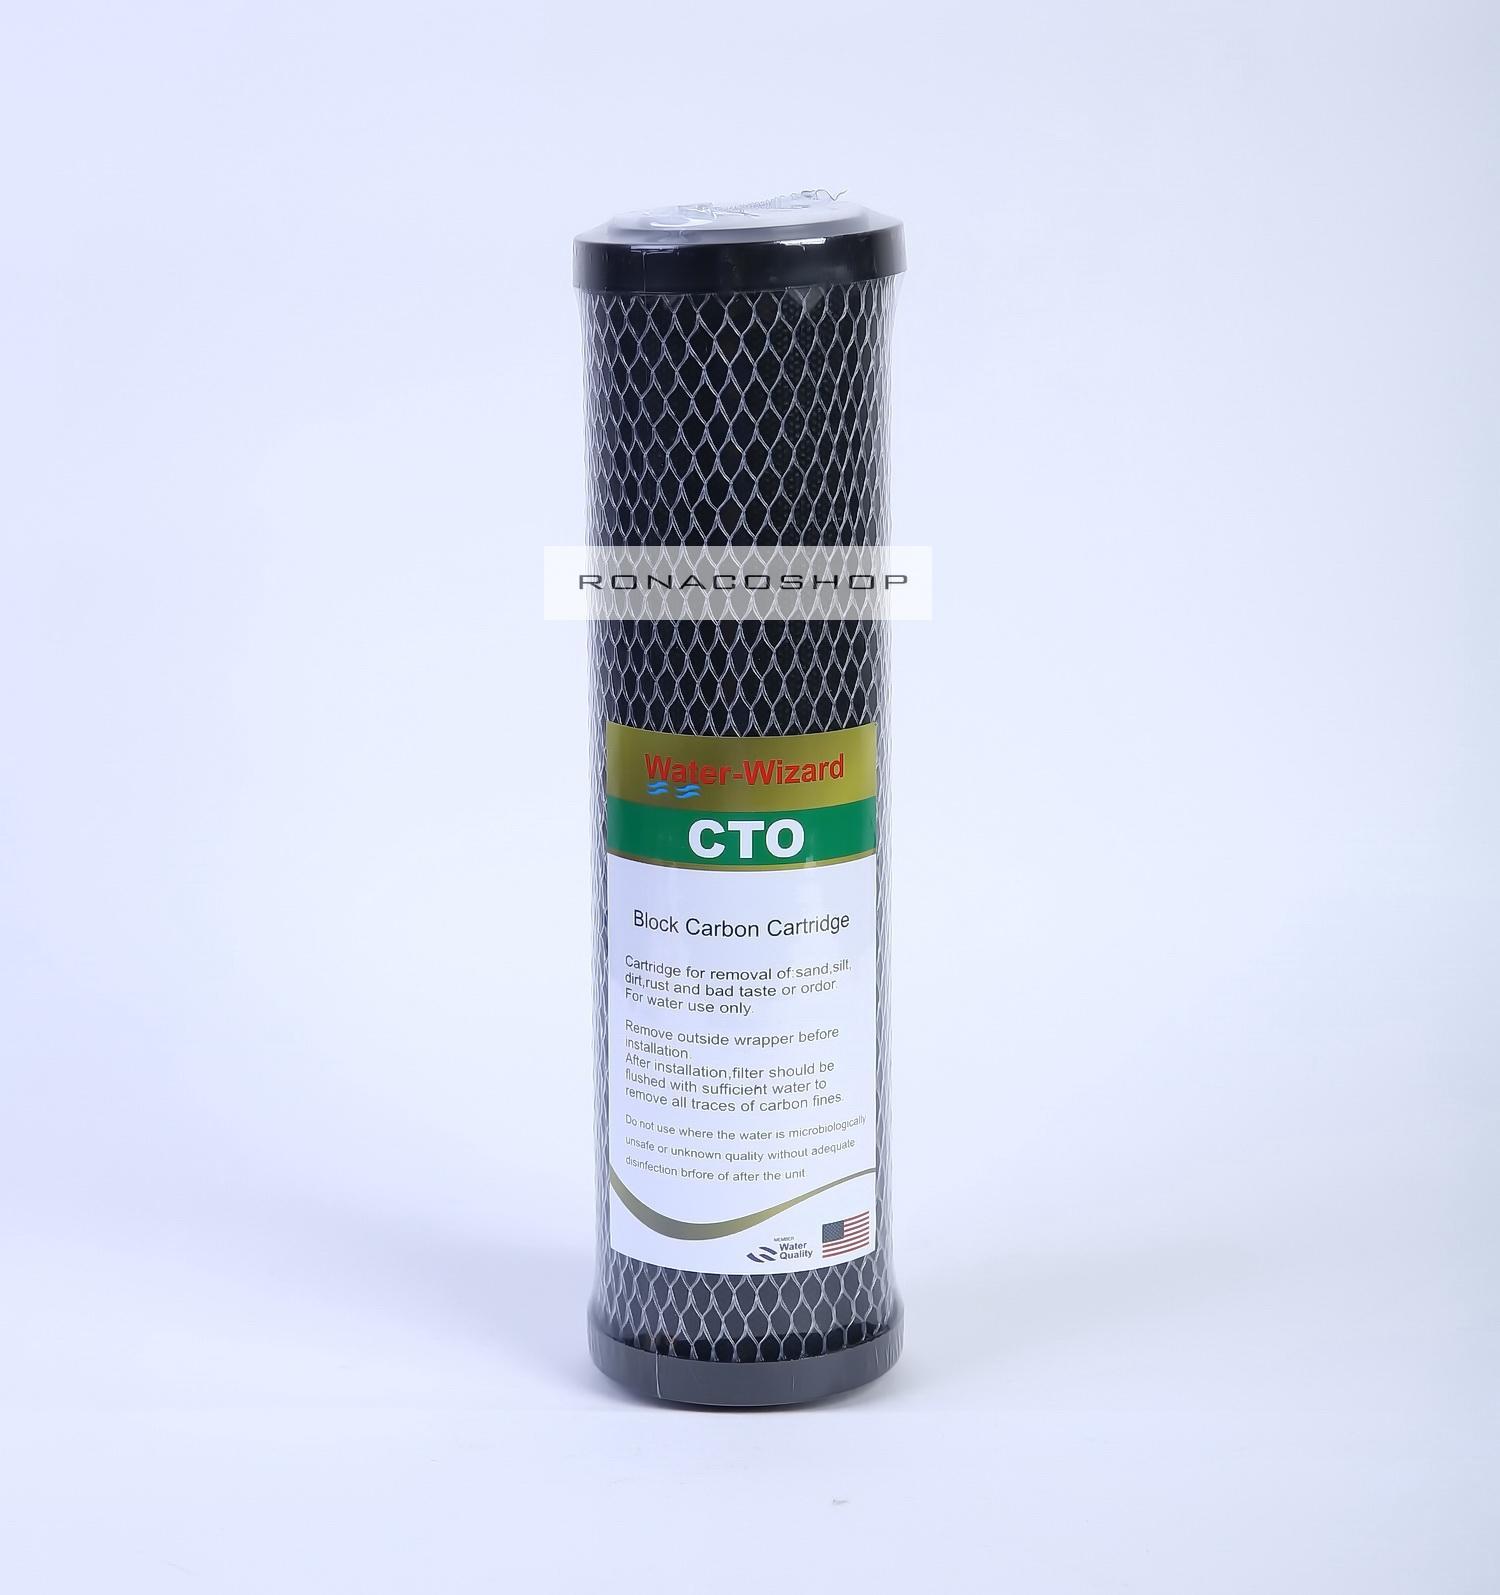 Kelebihan Ronaco Full Set 2 Buah Filter Air Dengan Nano 5 10in Mikron Dan Actived Carbon Block